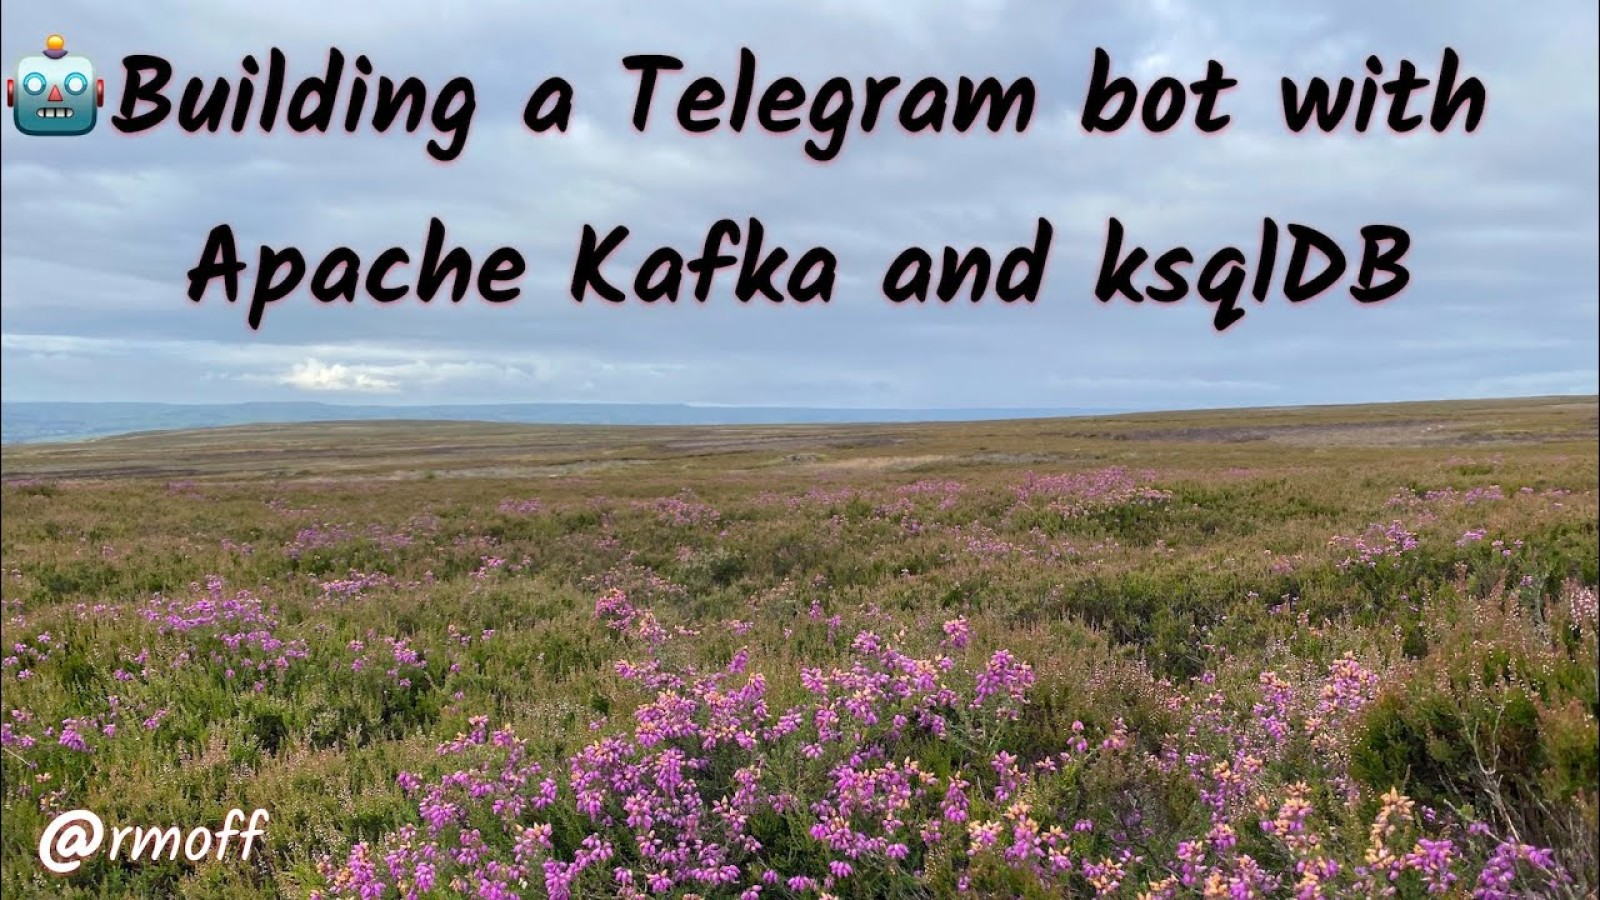 🤖 Building a Telegram bot with Apache Kafka, Go, and ksqlDB